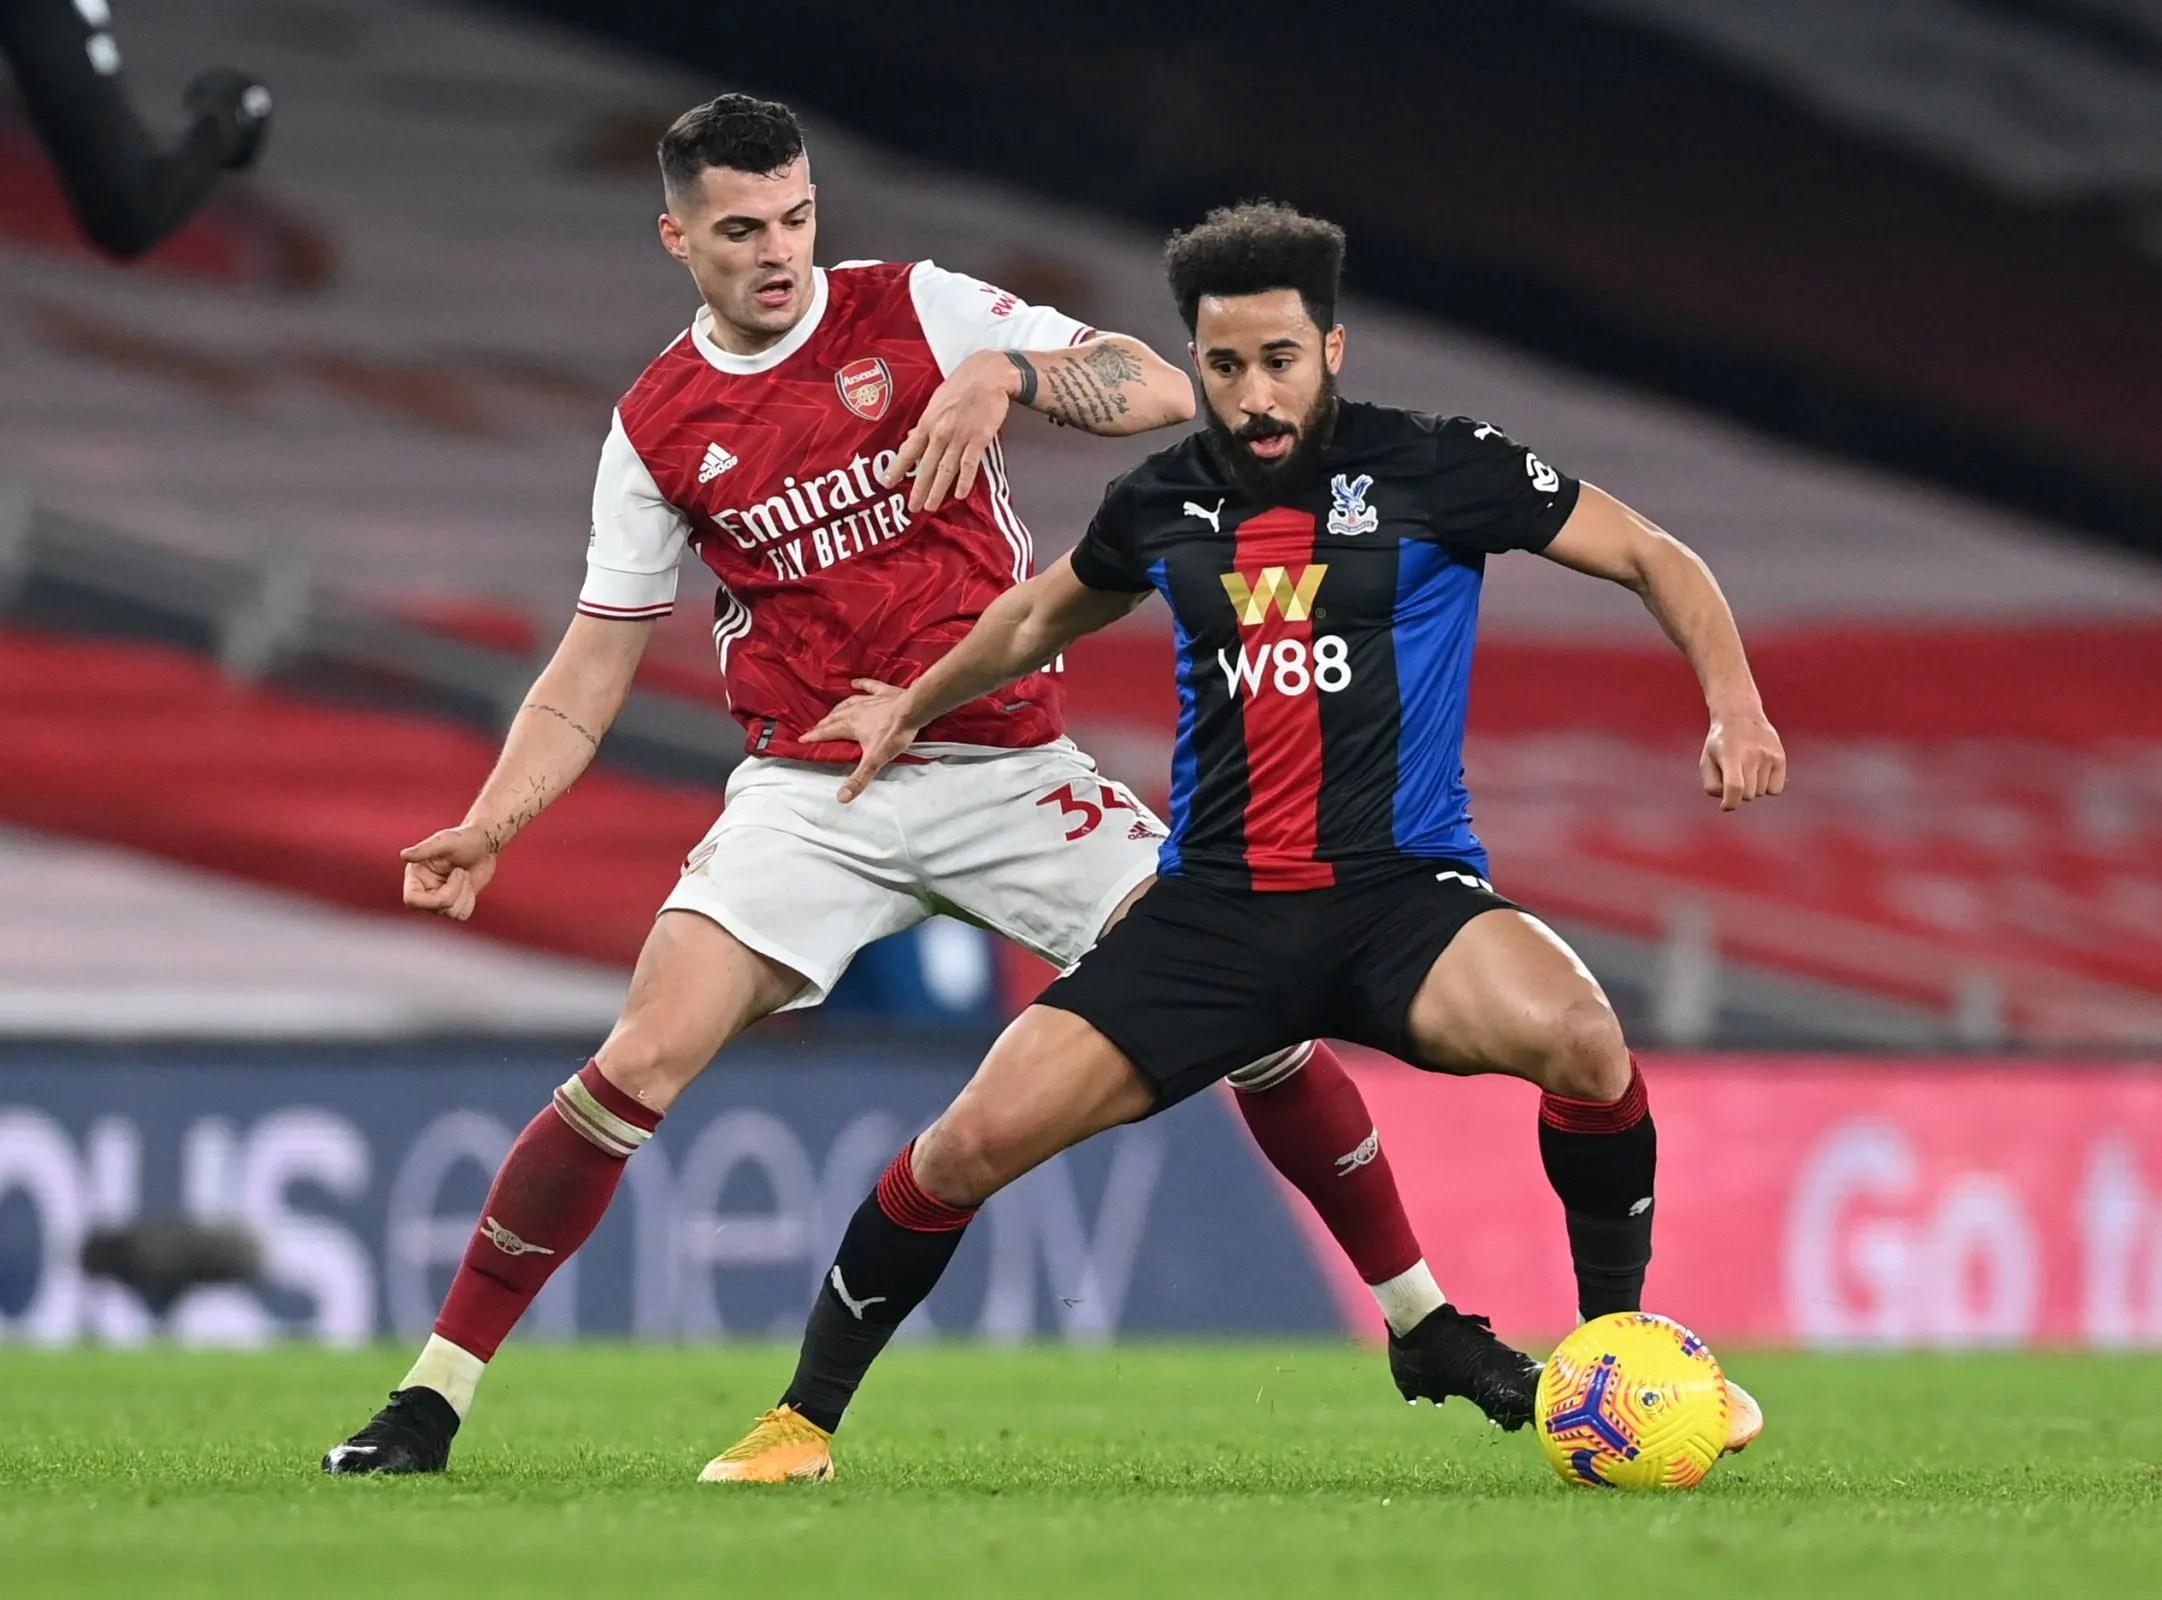 Arsenal's Xhaka was superb vs Palace